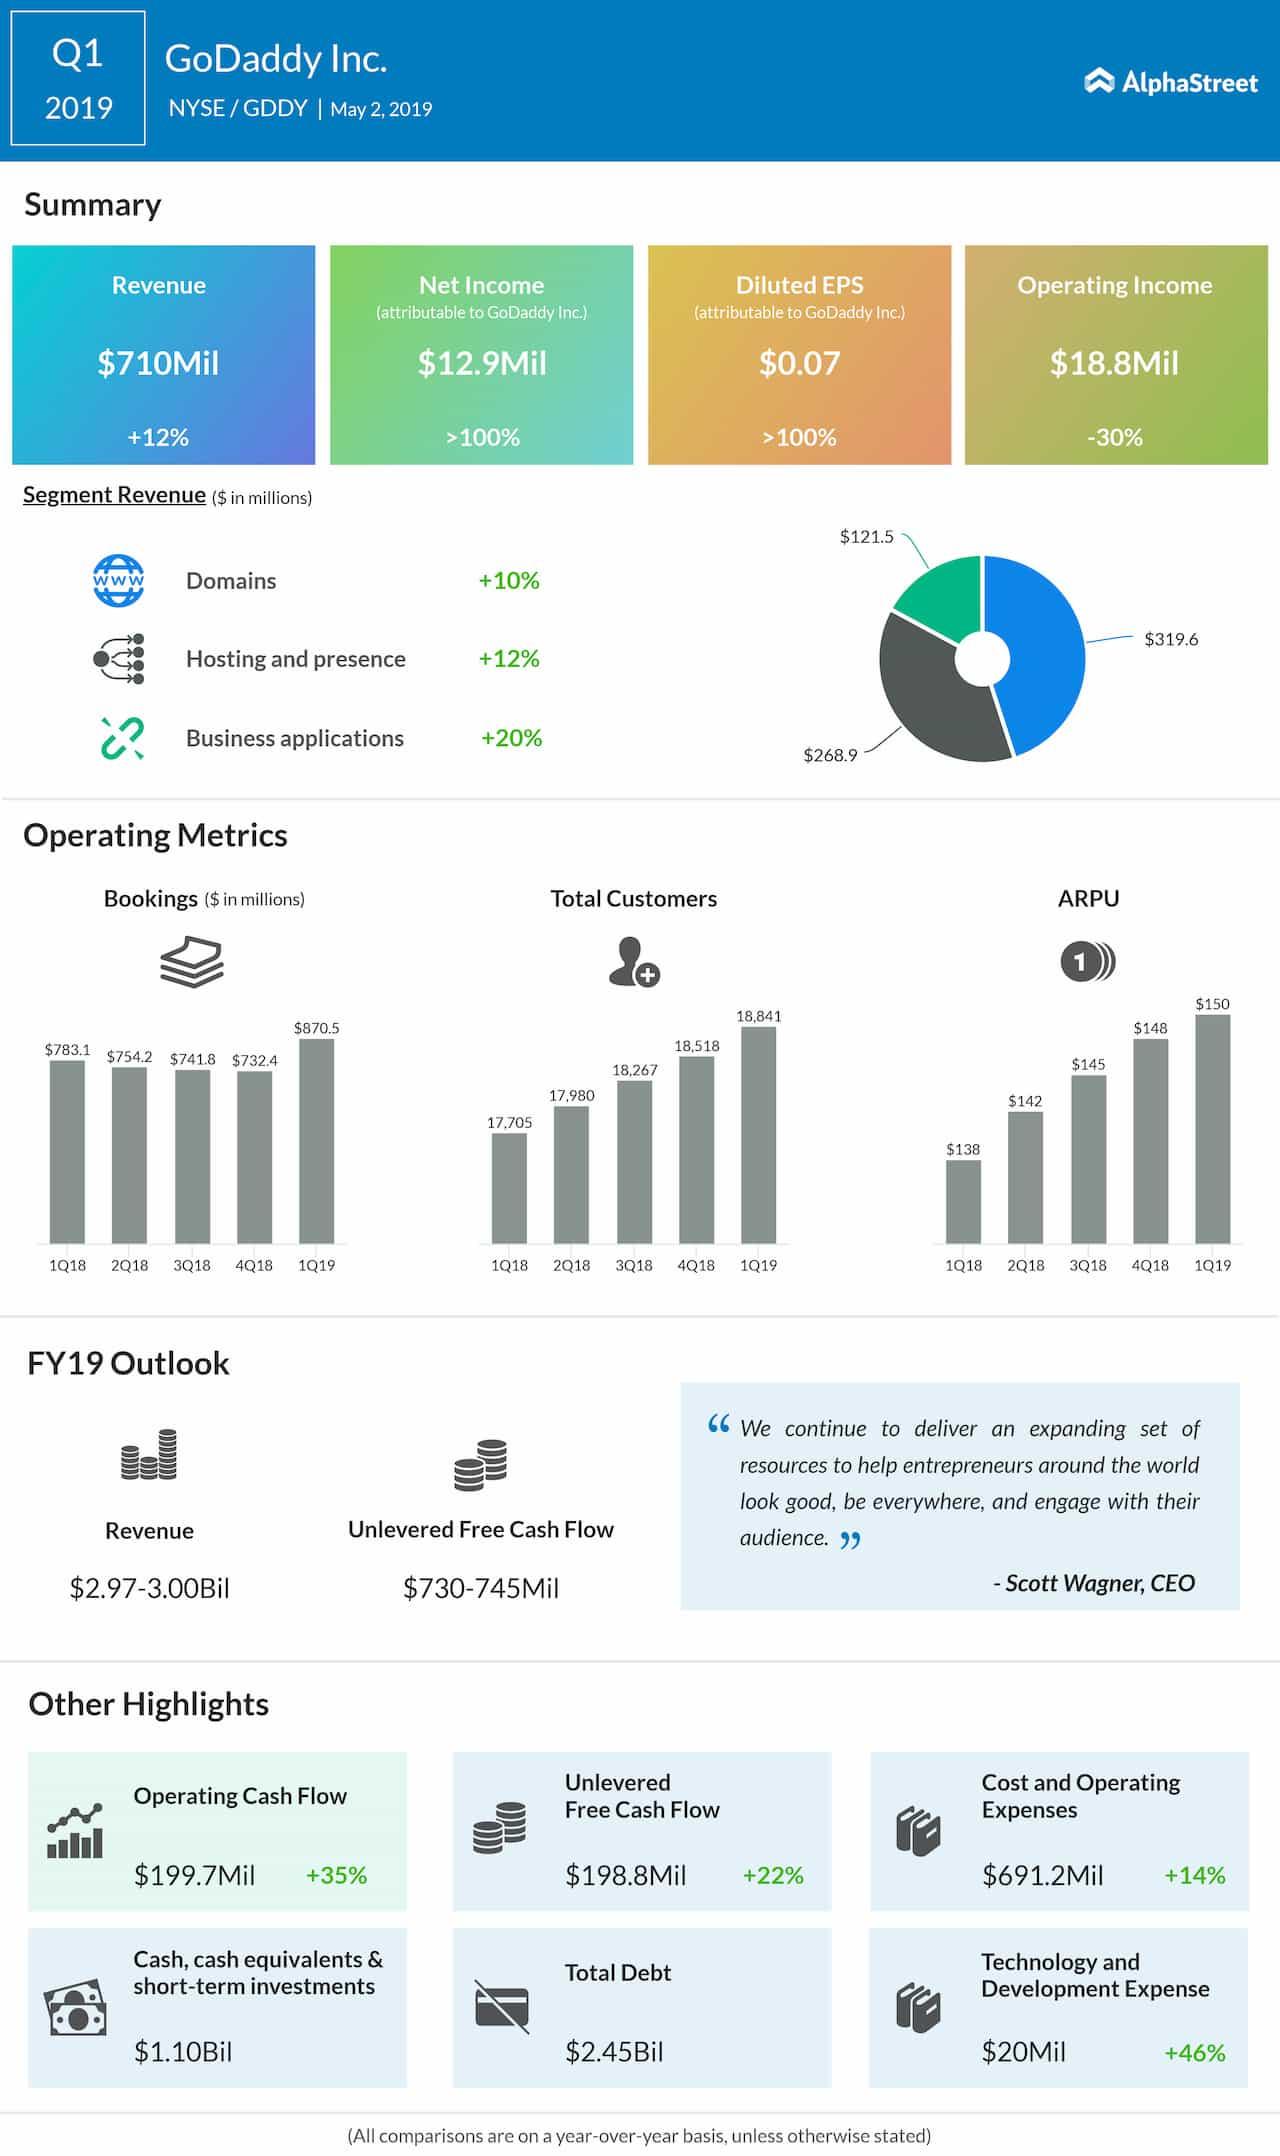 GoDaddy Q1 2019 earnings infographic